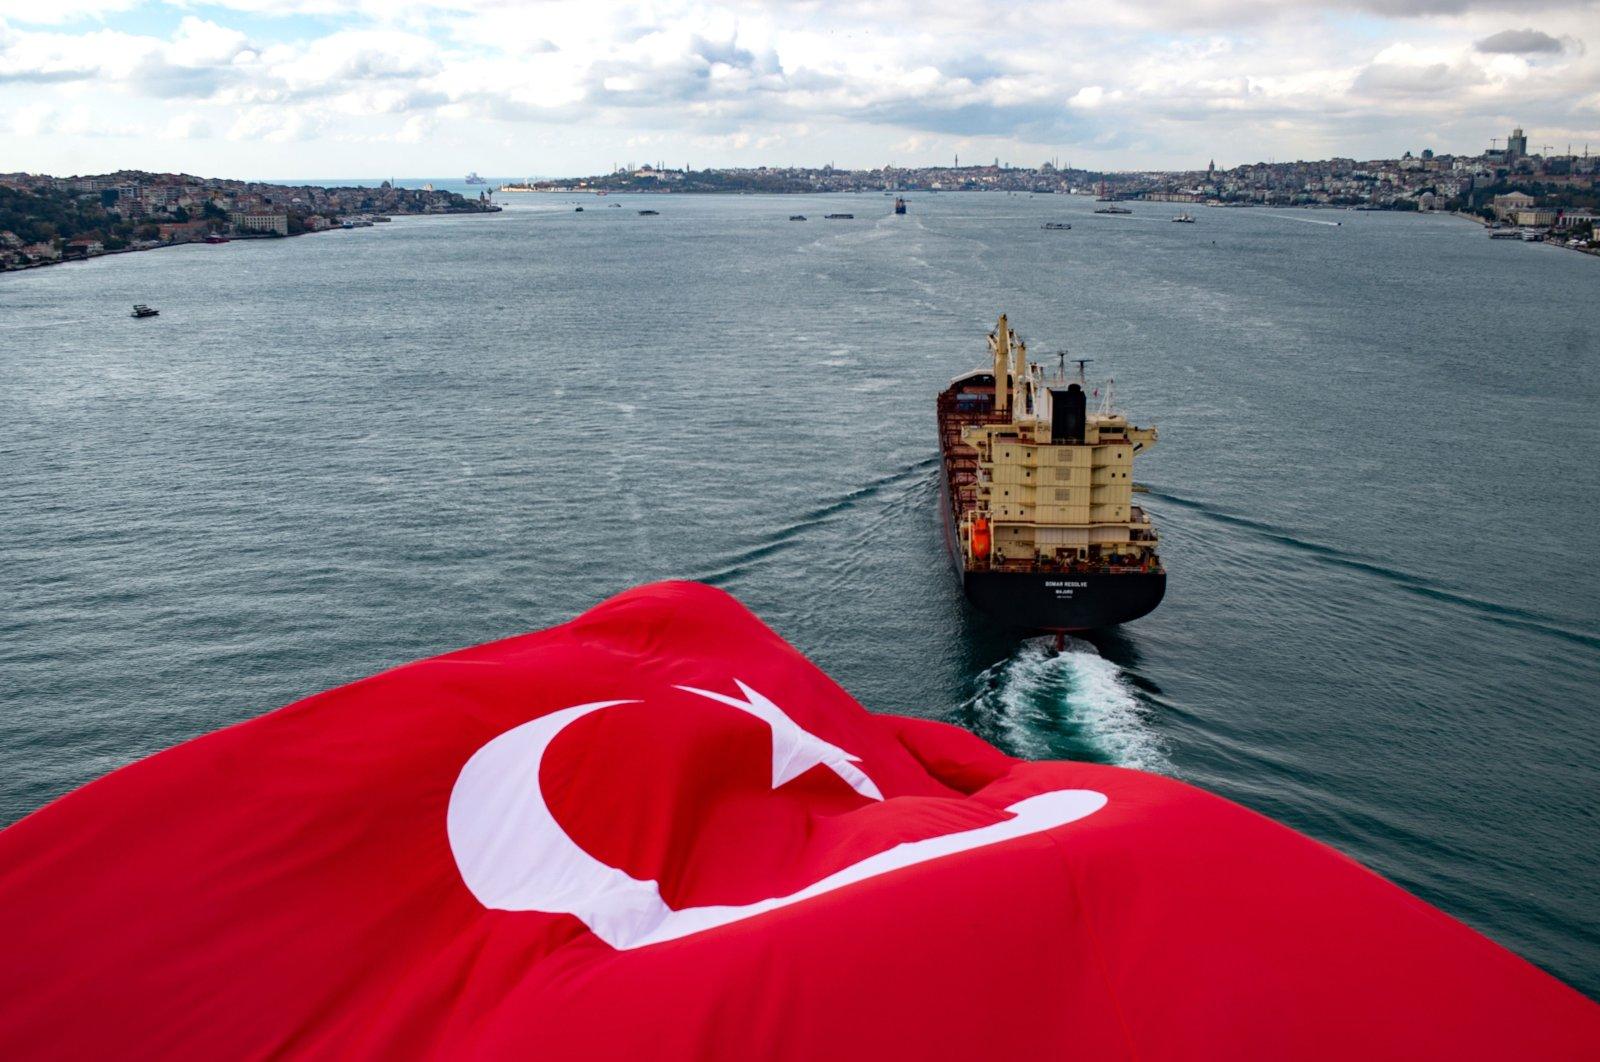 Turkey's national flag waves on the July 15 Martyrs' Bridge, known as the Bosporus Bridge, in Istanbul, Turkey, Nov. 8, 2020. (AFP Photo)